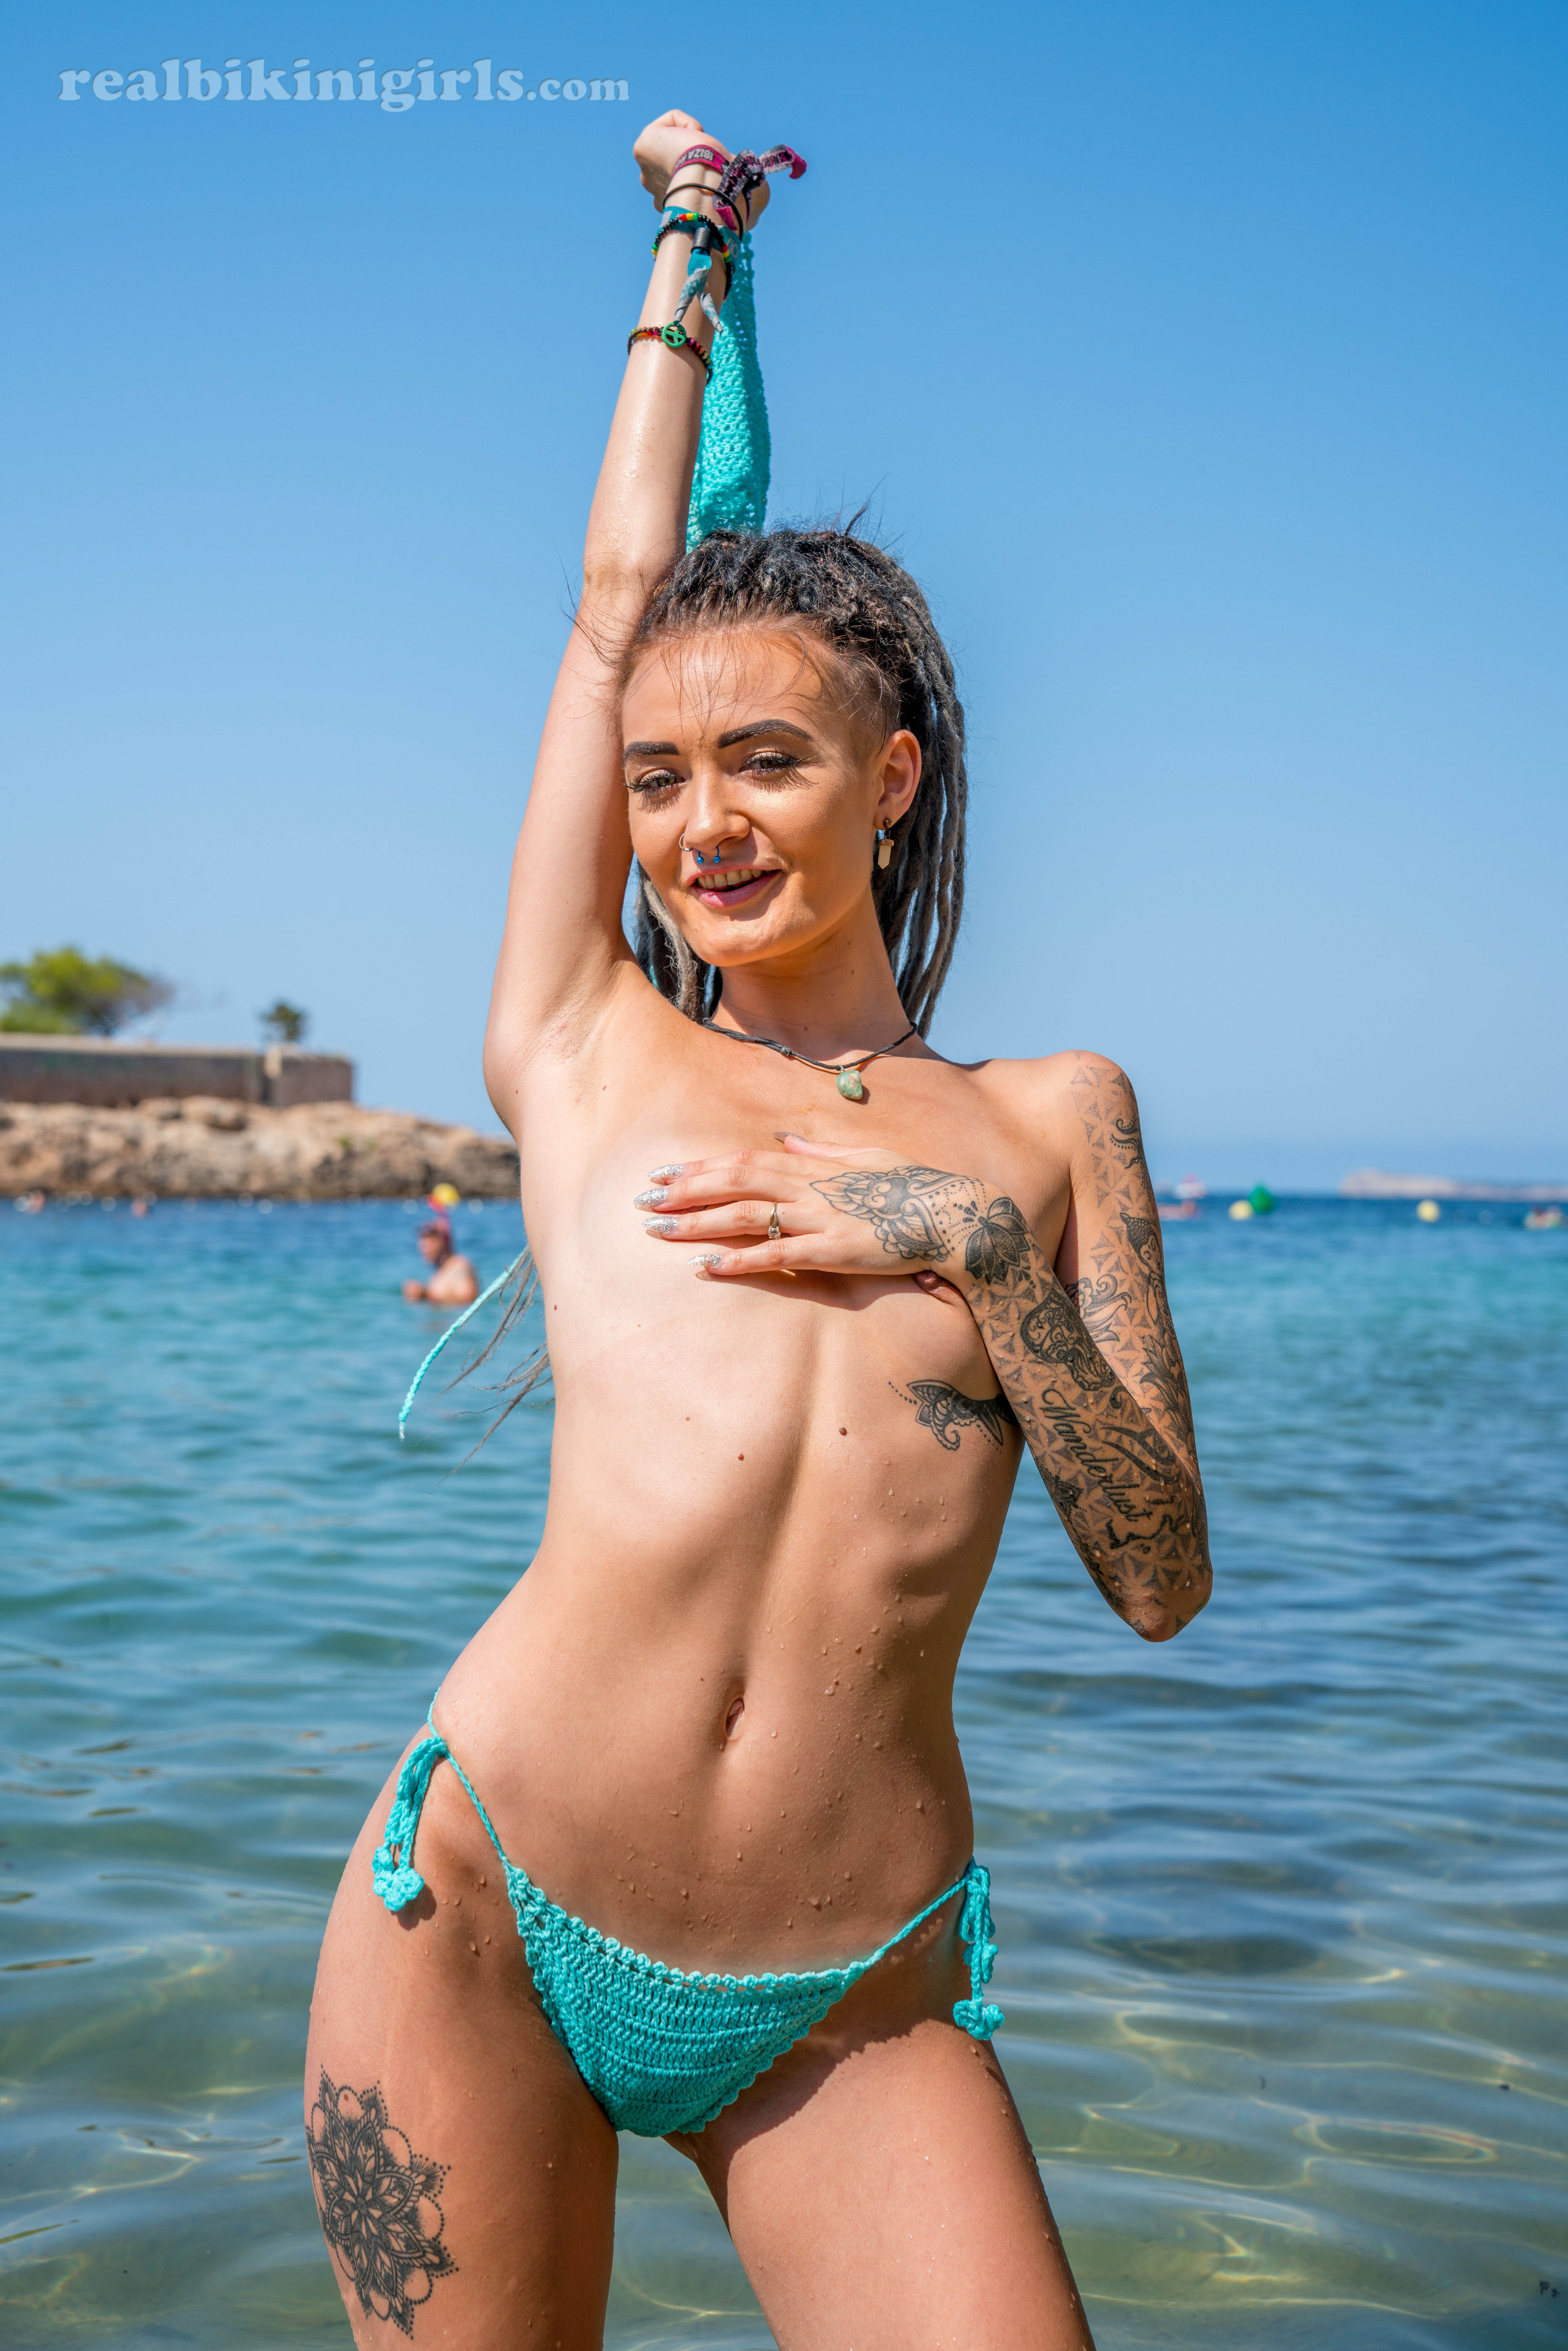 Hot bikini babes gallery